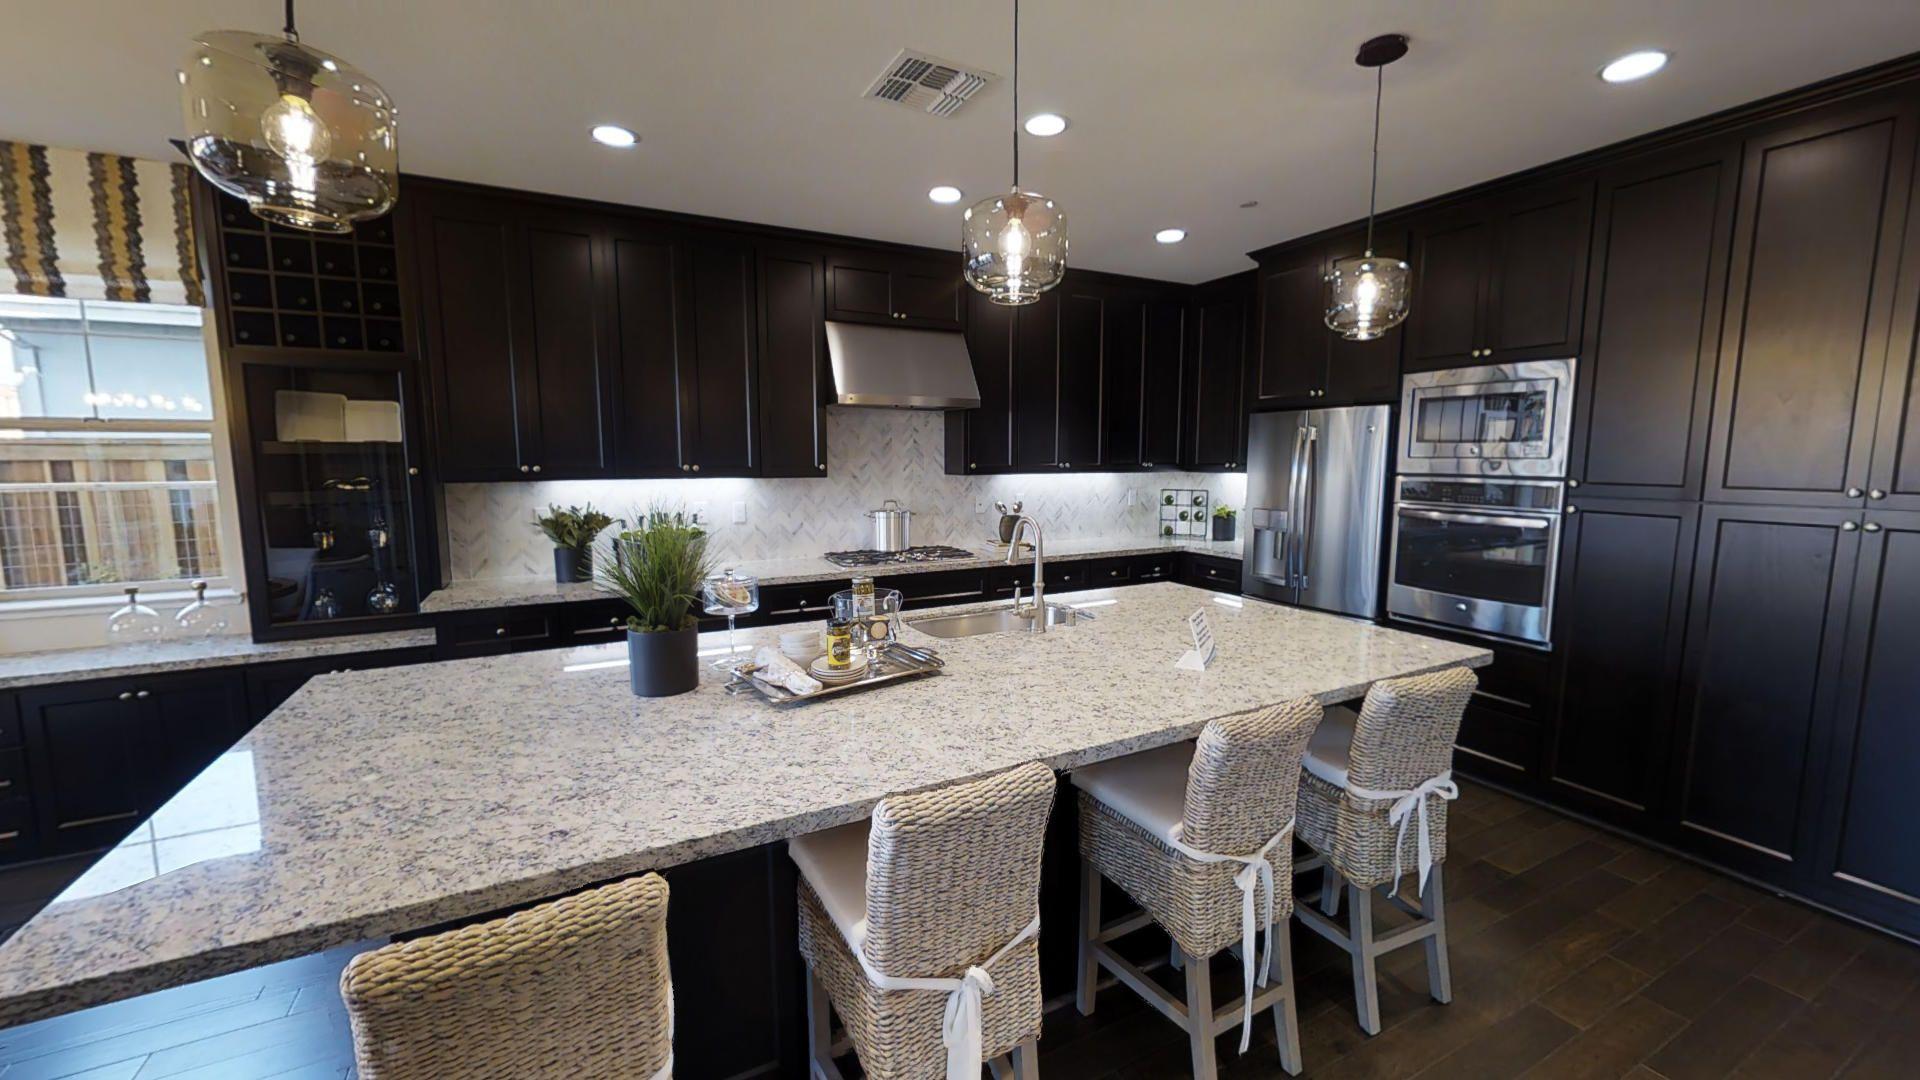 Residence Three Kitchen At Ashford New Neighborhood In Mountain